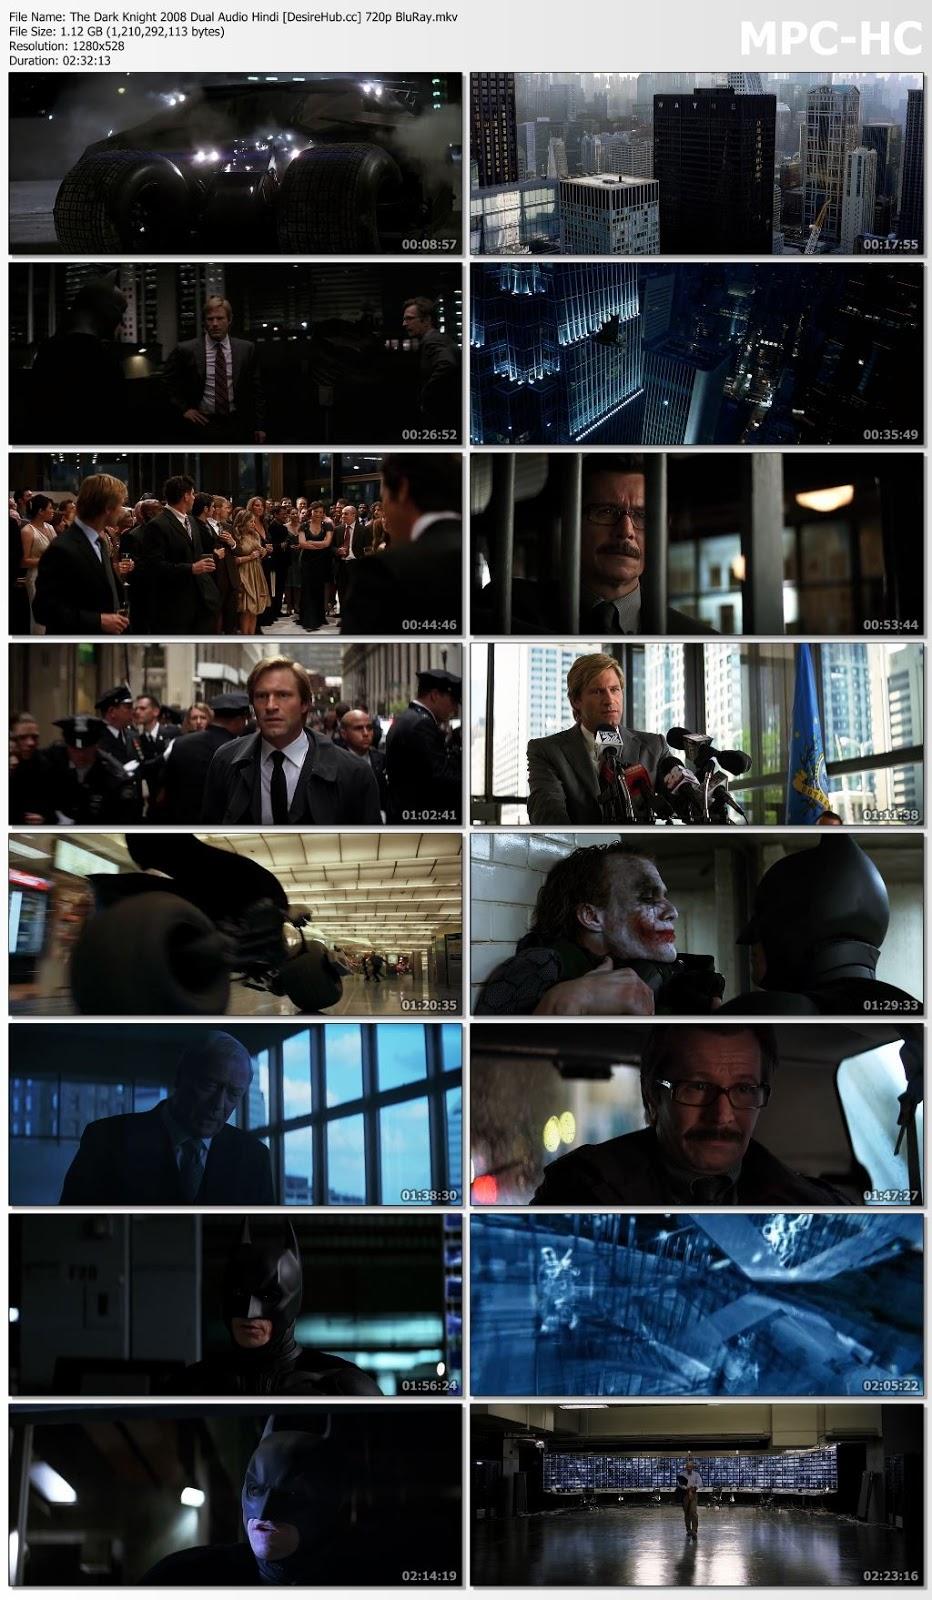 The Dark Knight 2008 Dual Audio Hindi 480p BluRay 450mb Desirehub